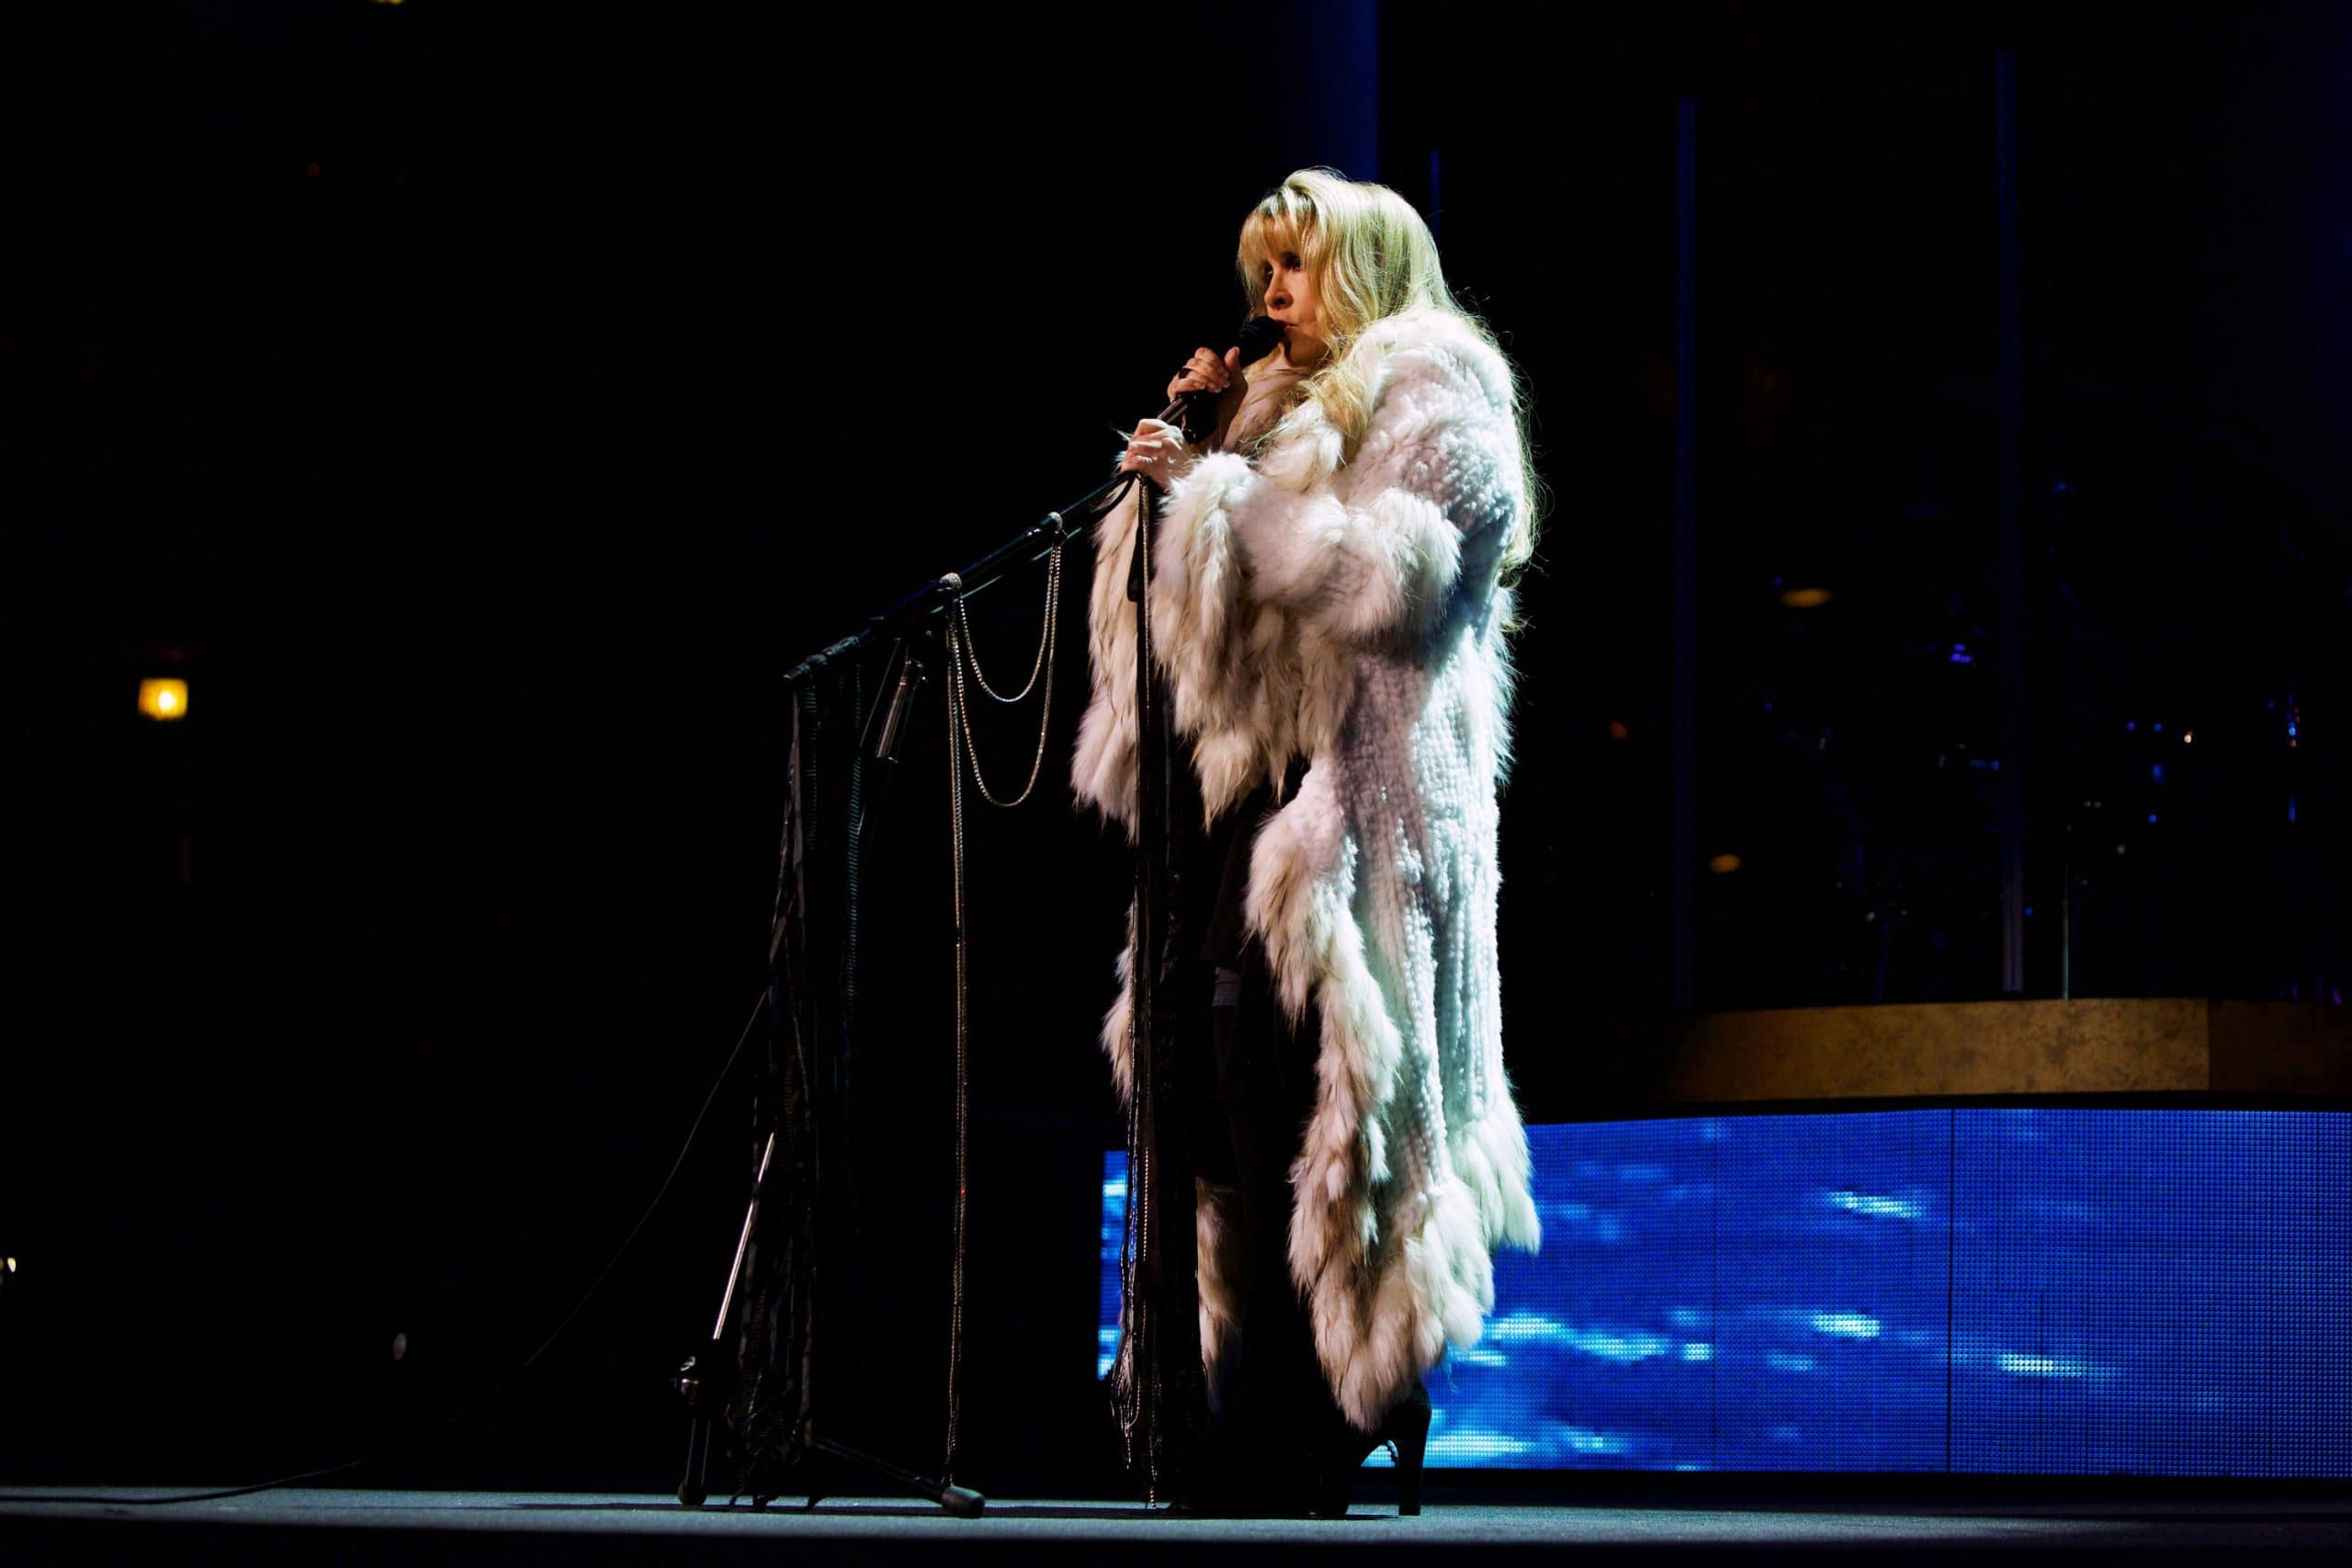 STEVIE NICKS 24 KARAT GOLD THE CONCERT, Stevie Nicks performing in Chicago